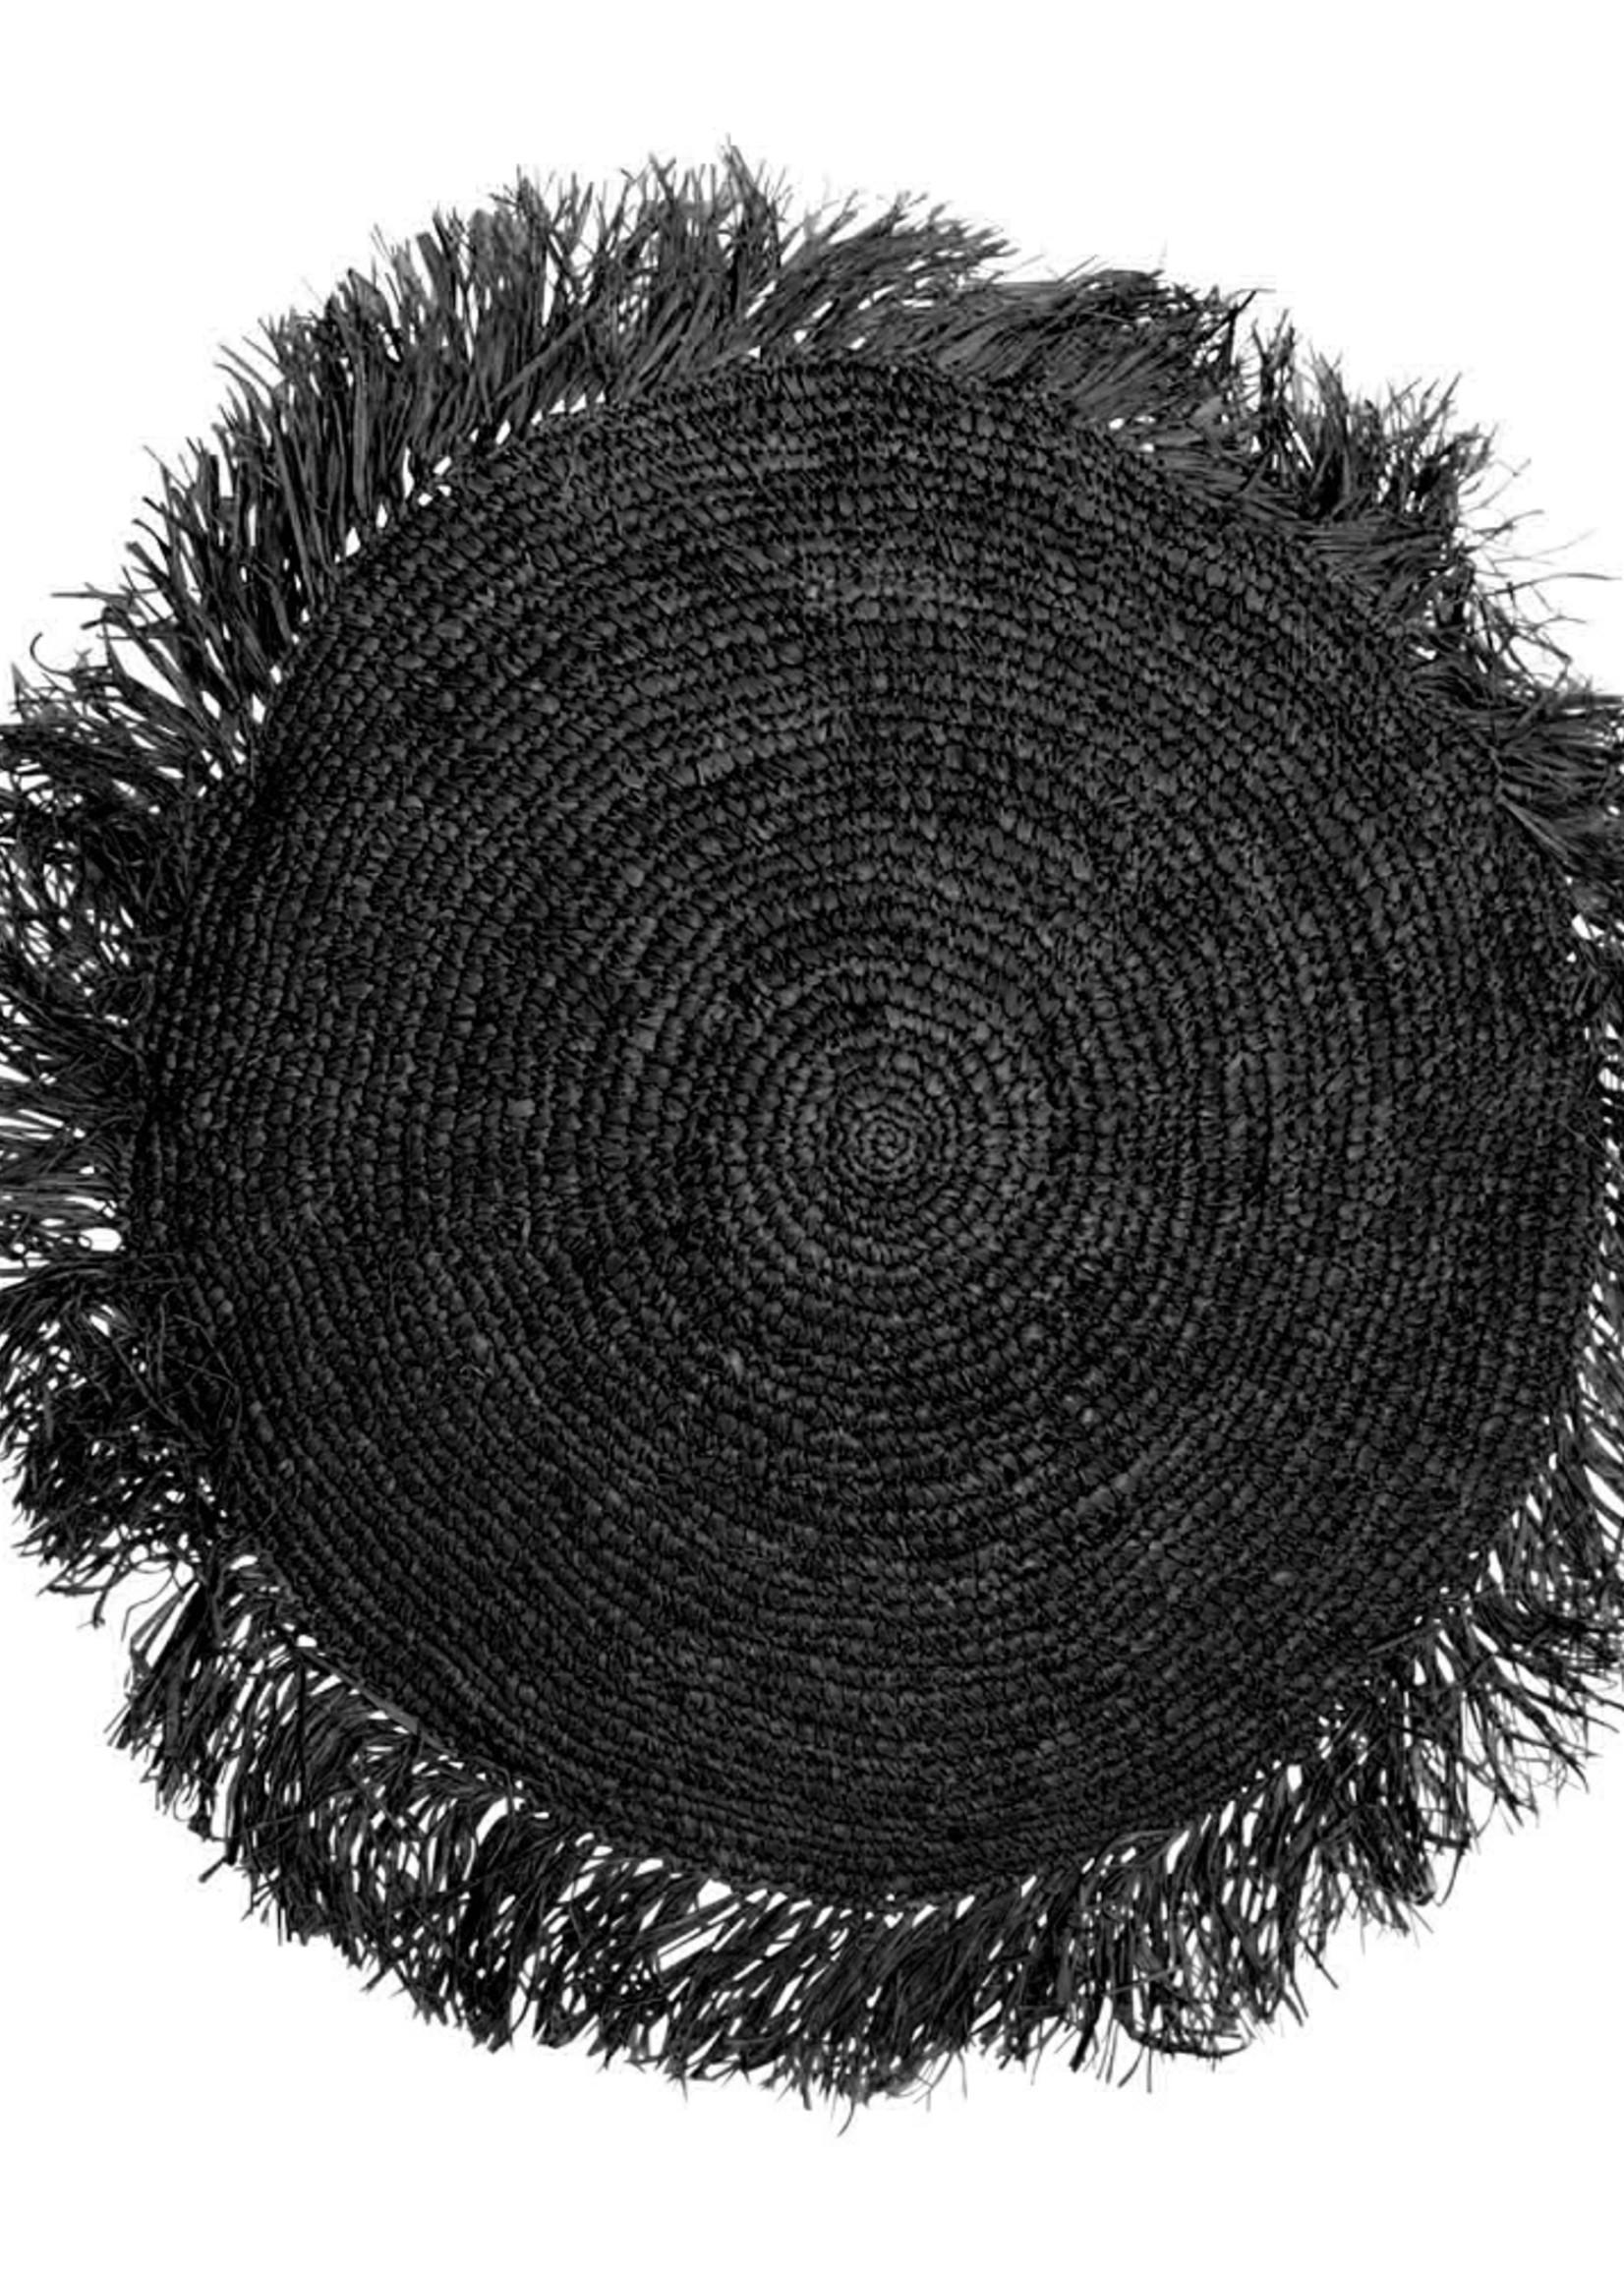 The Raffia Cushion Round - Black - L